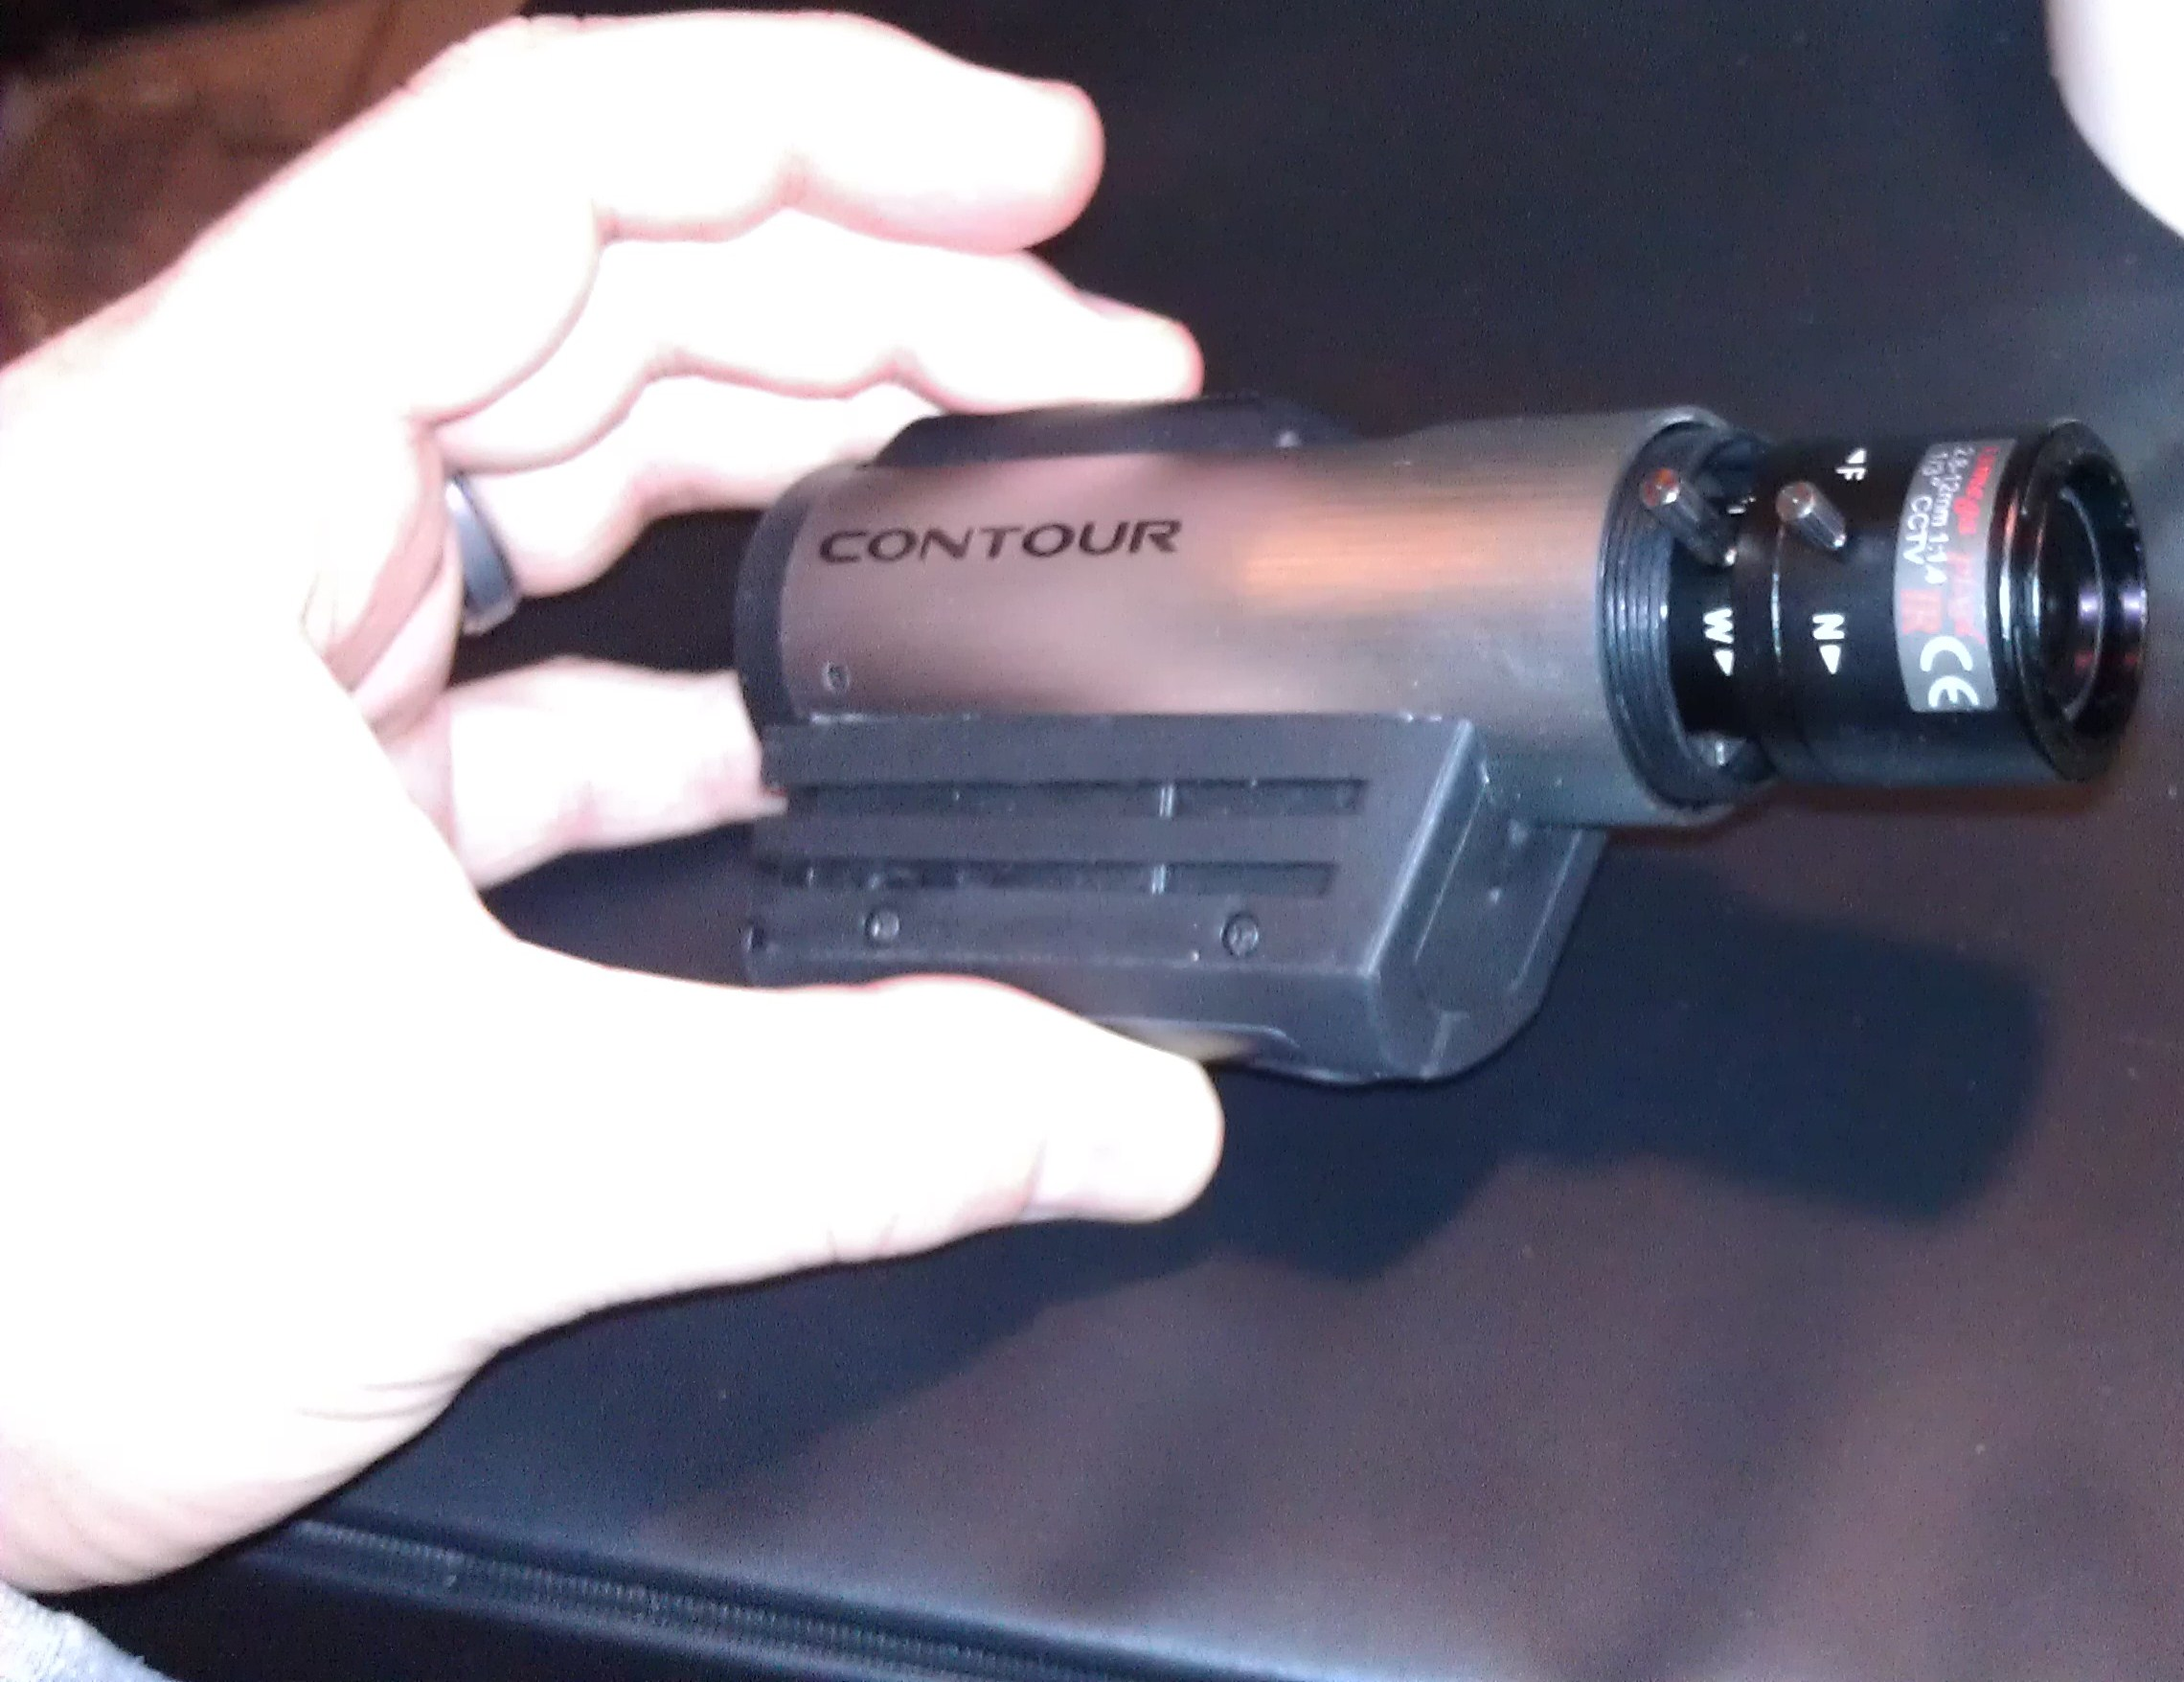 contour roam model 1600 manual